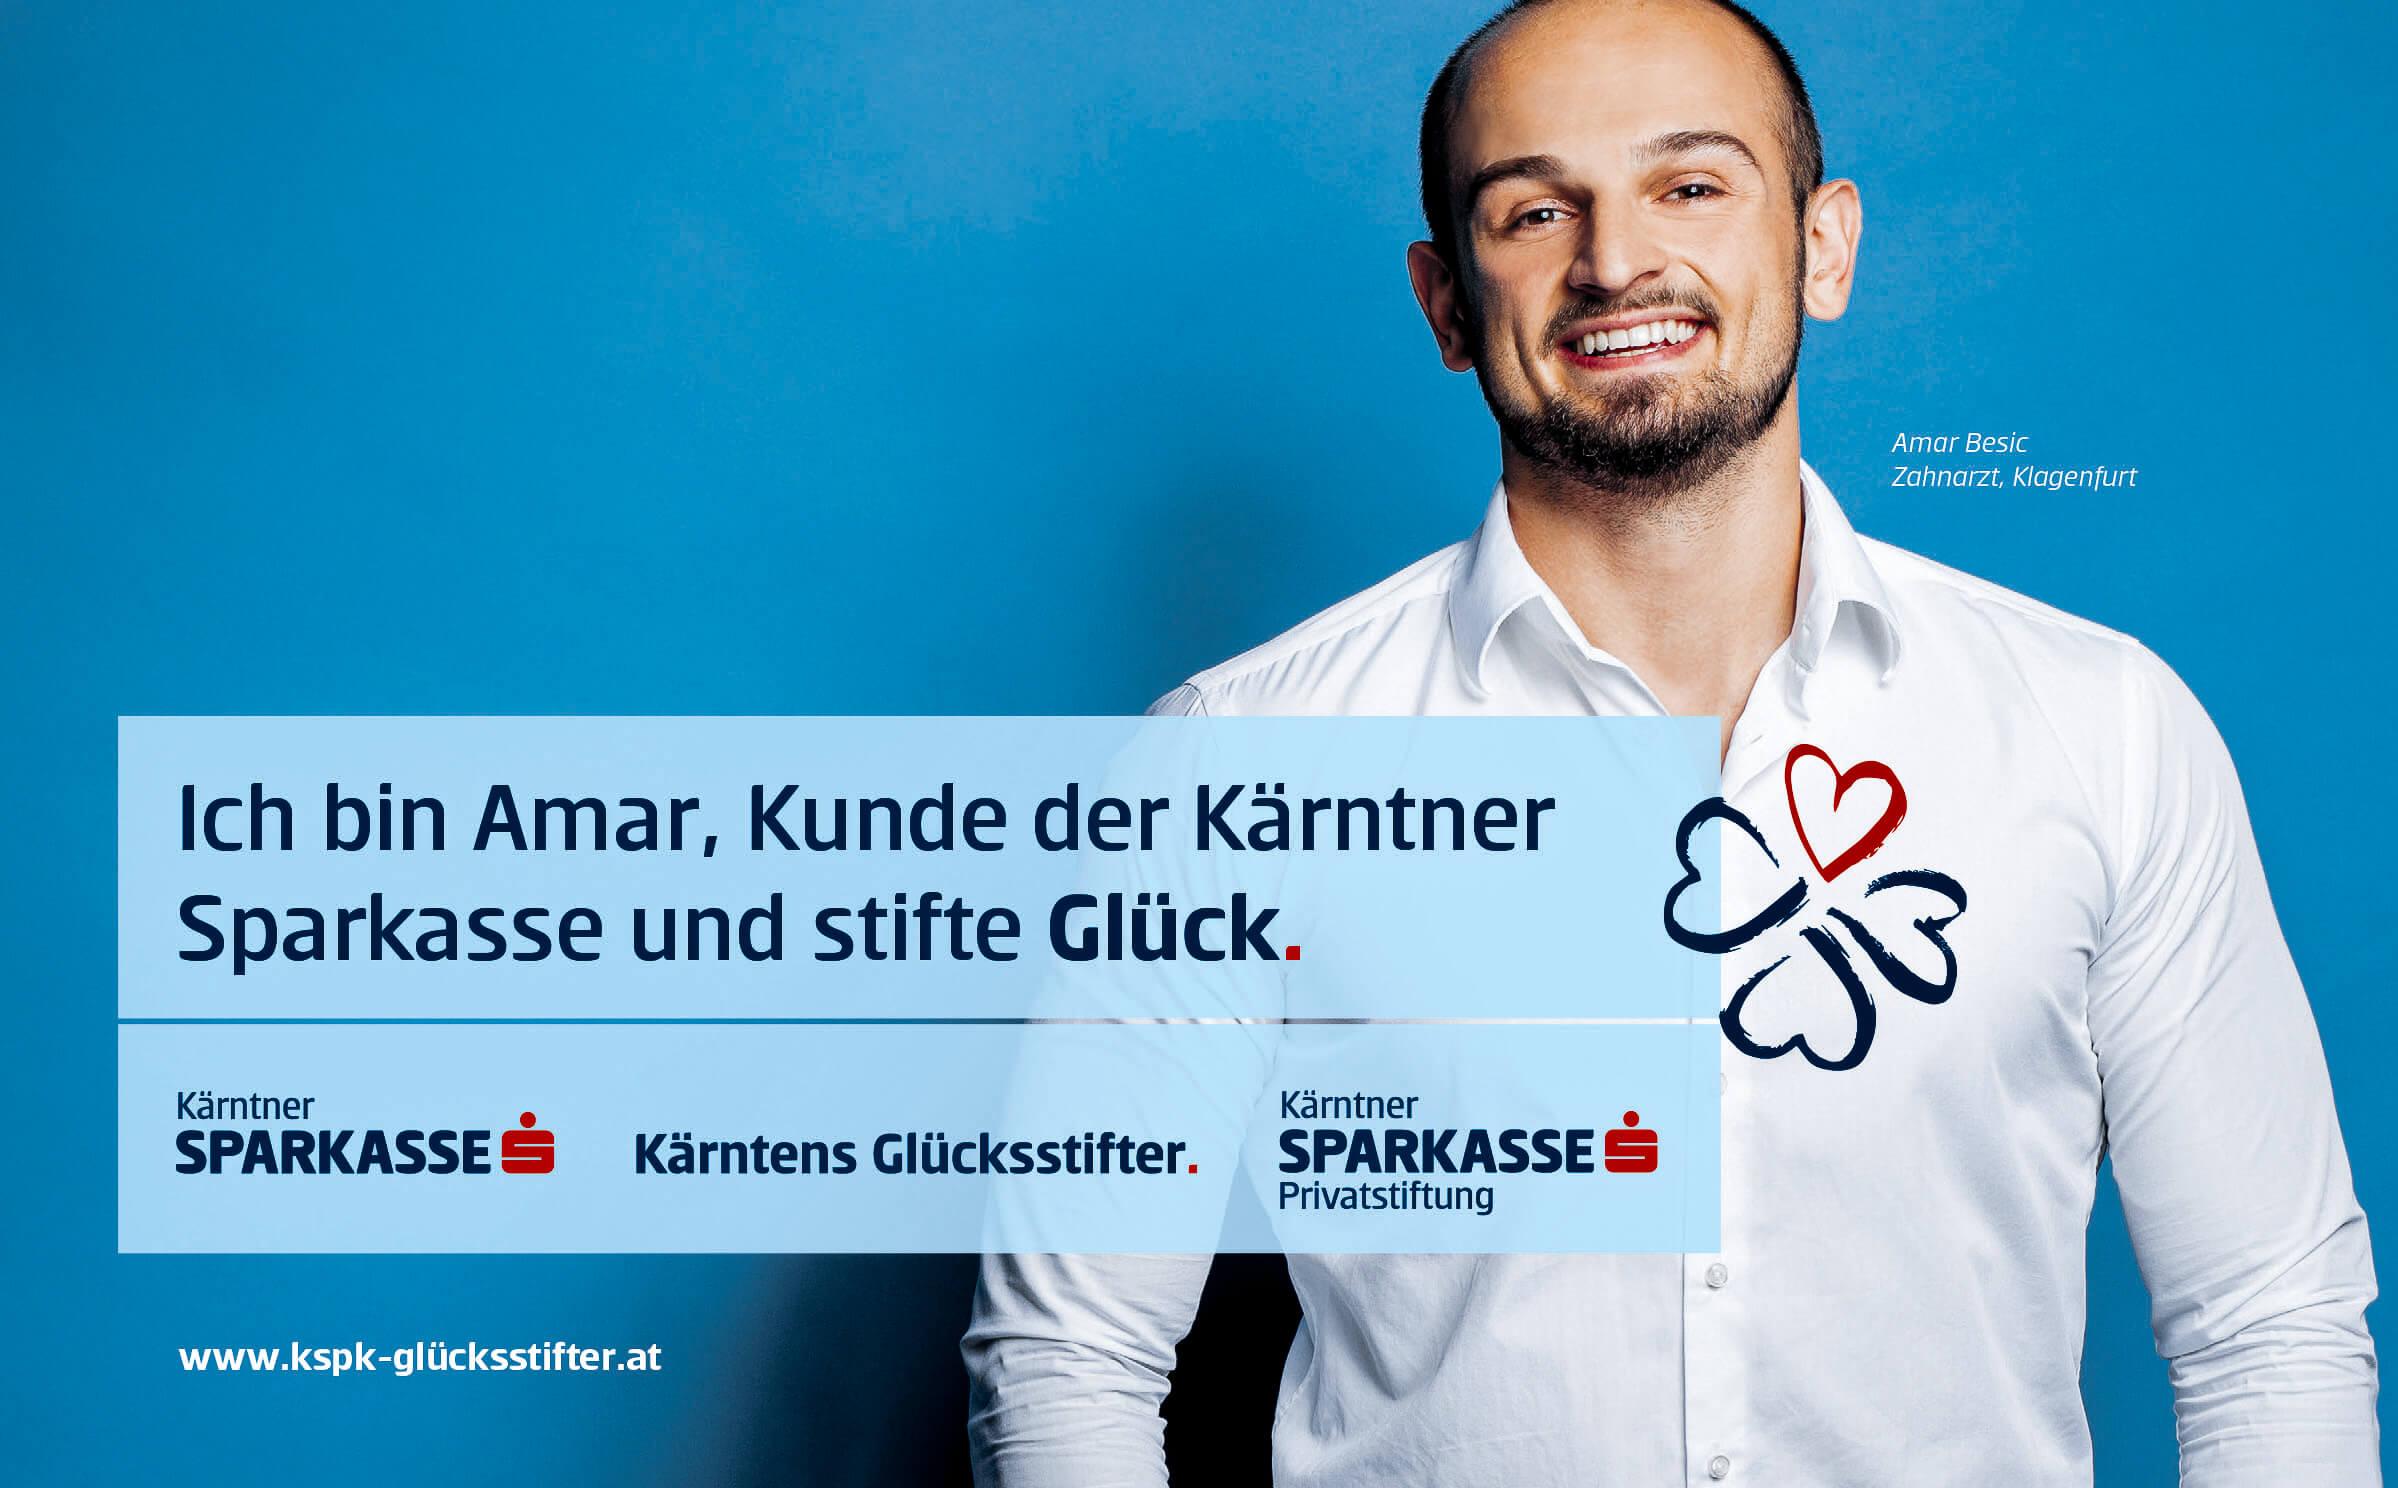 Sparkasse_Glücksstifter_Kampagne_Kärnten_Klagenfurt_BigBang_Daniel_Waschnig